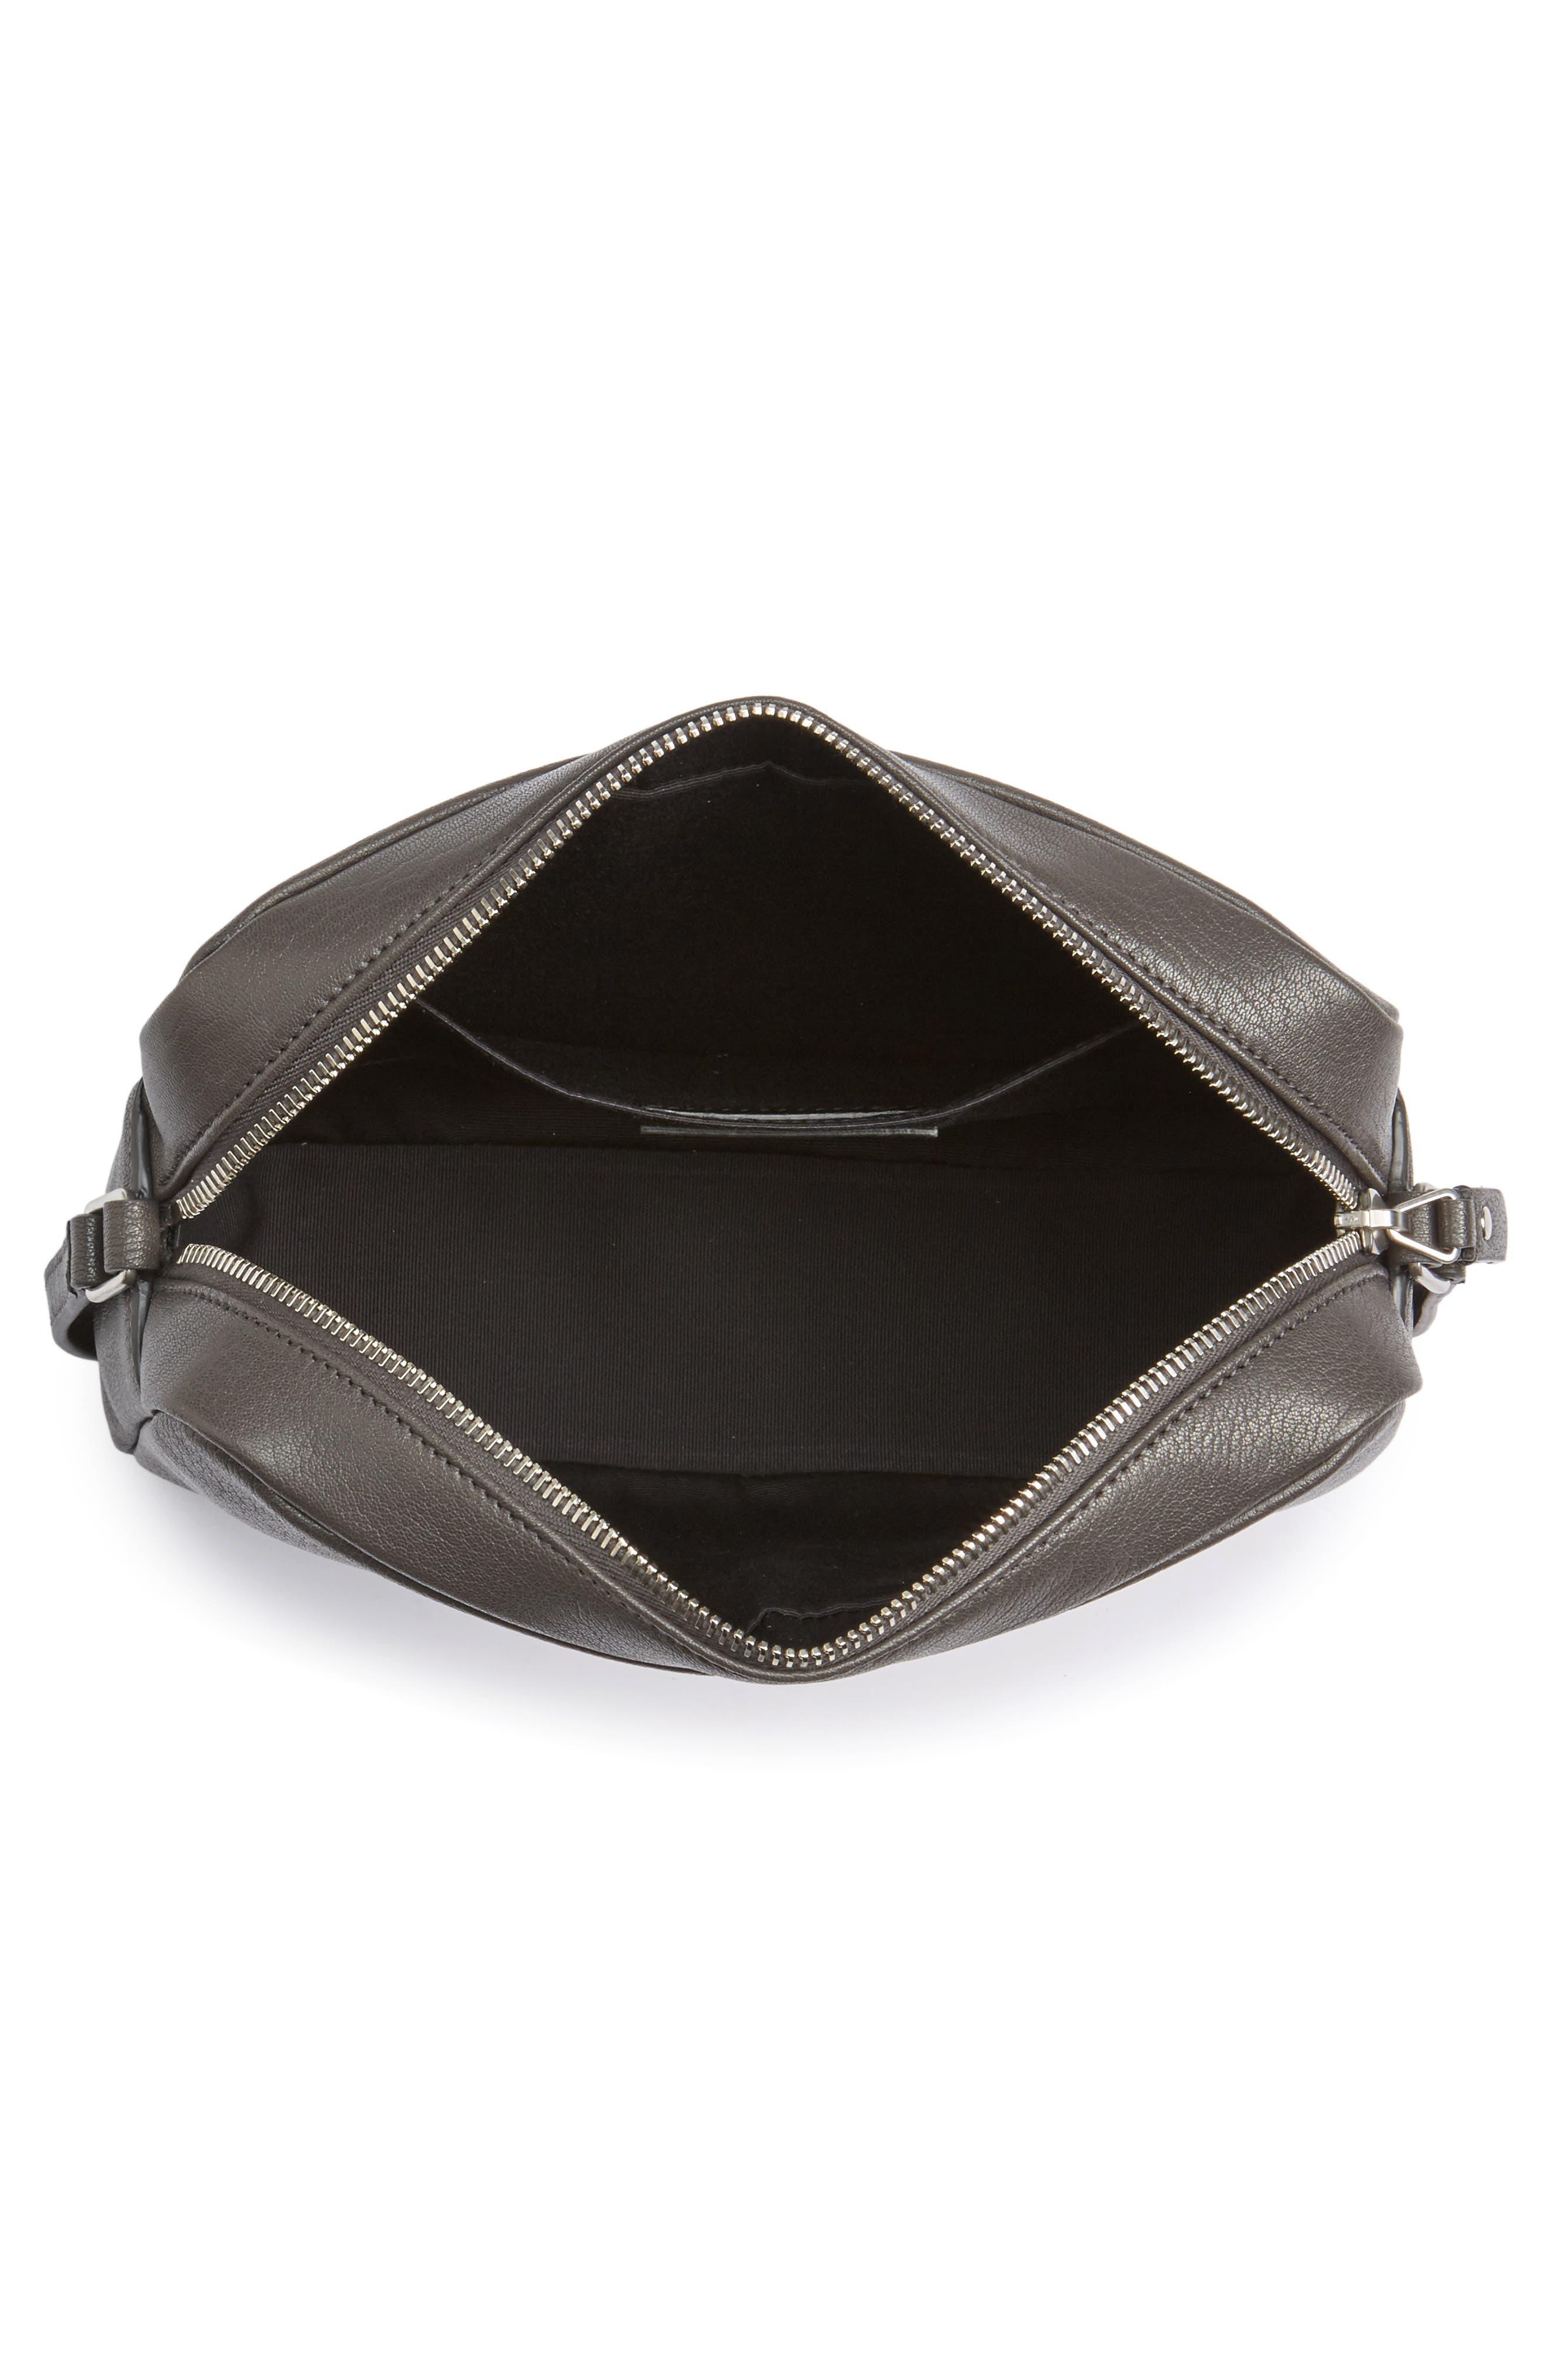 Small Mono Leather Camera Bag,                             Alternate thumbnail 4, color,                             Asphalt